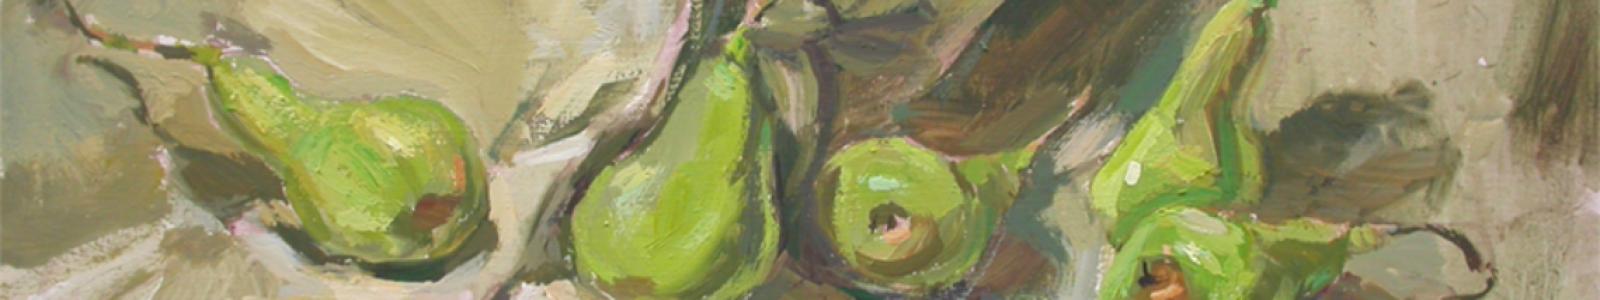 Gallery Designer Yriu Semionov